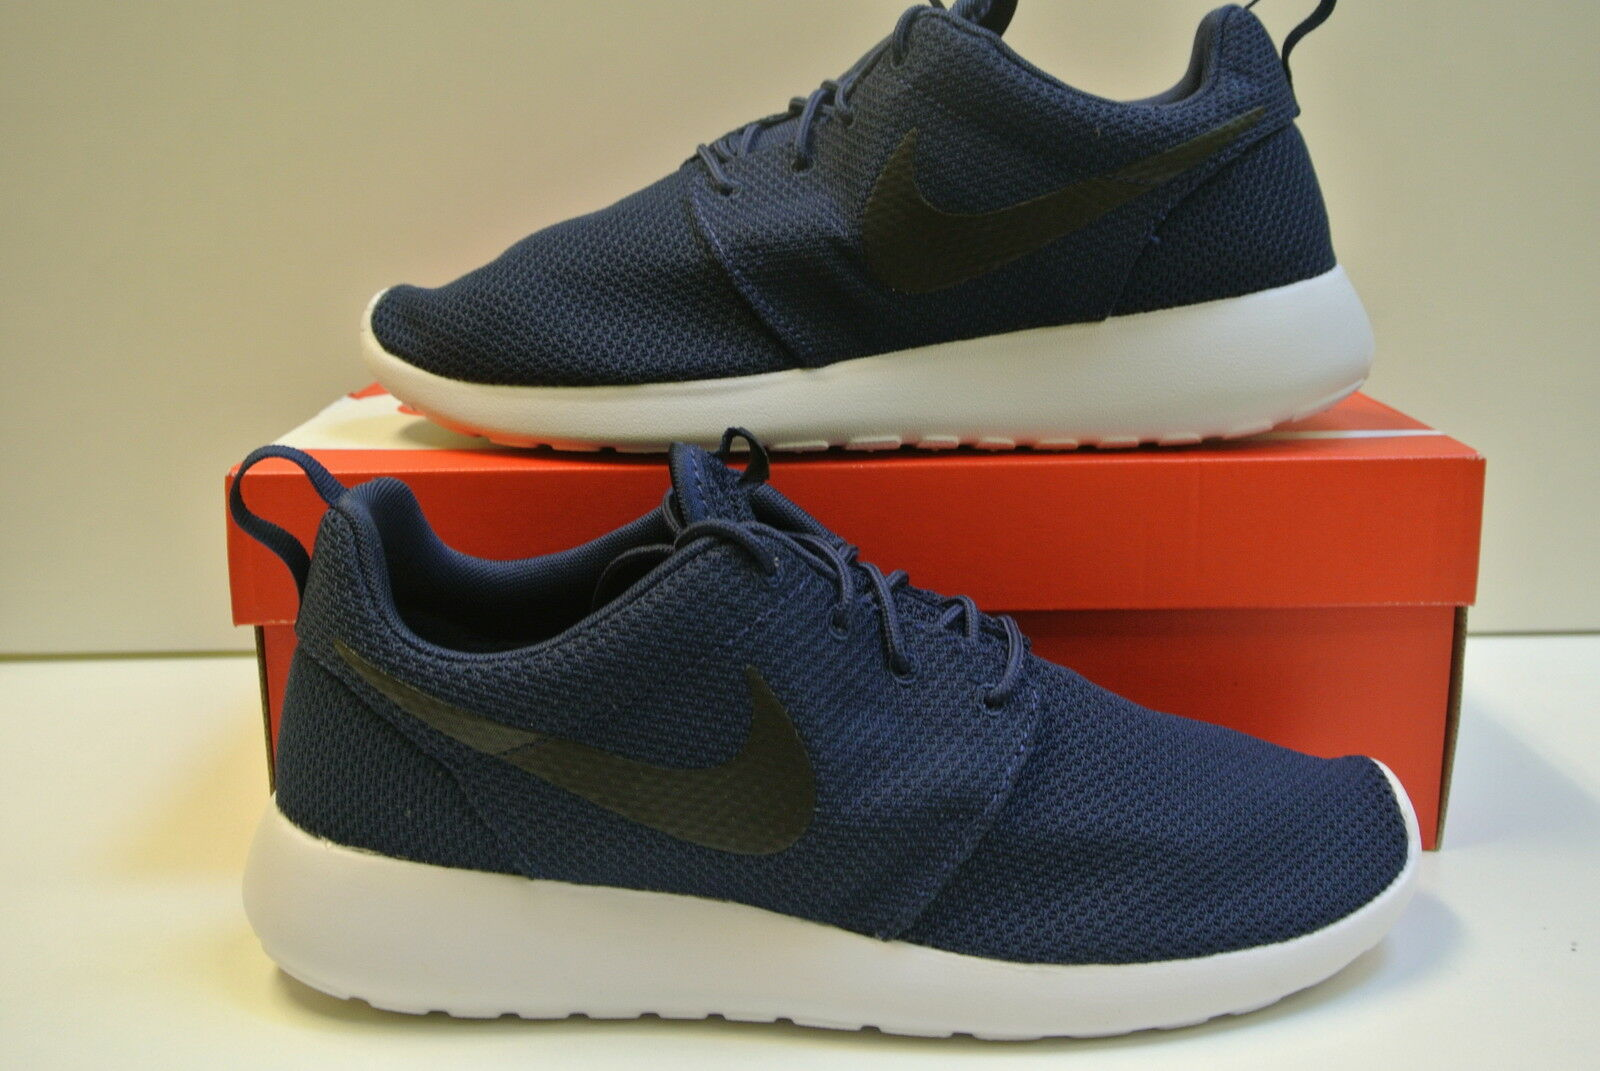 Nike roshe one Rosherun talla elegibles nuevo embalaje original & 511881 405